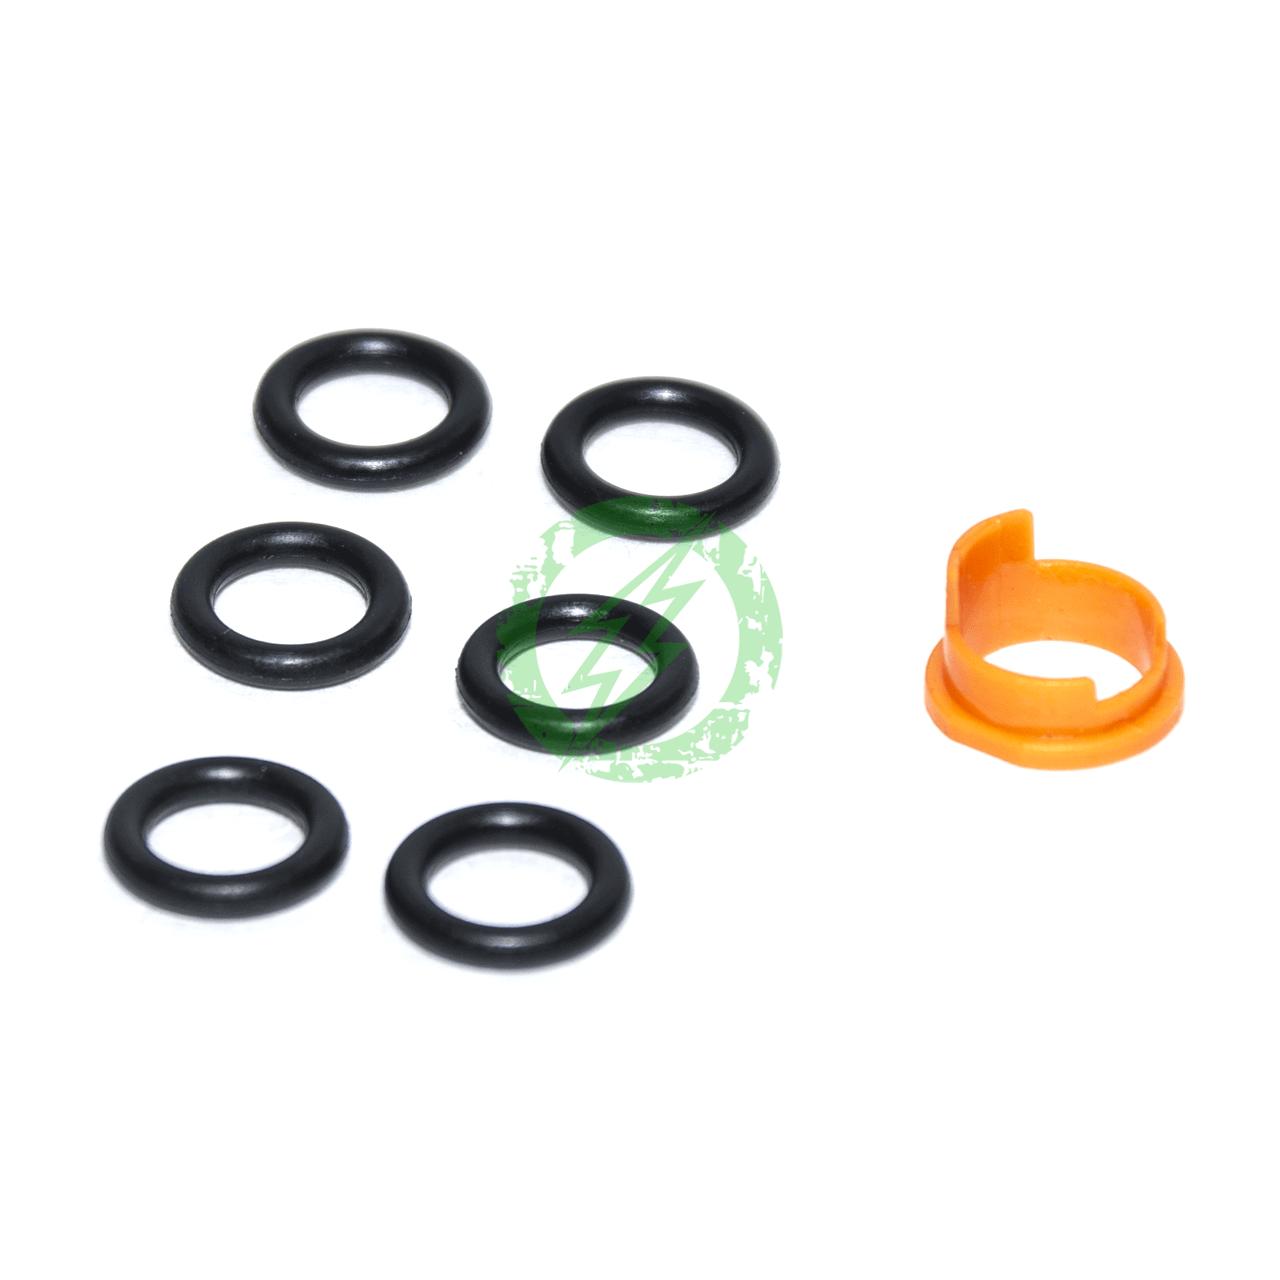 Airtech Studios Advanced Hop-Up Chamber/Inner Barrel Locking Ring for MAXX Hop-Up